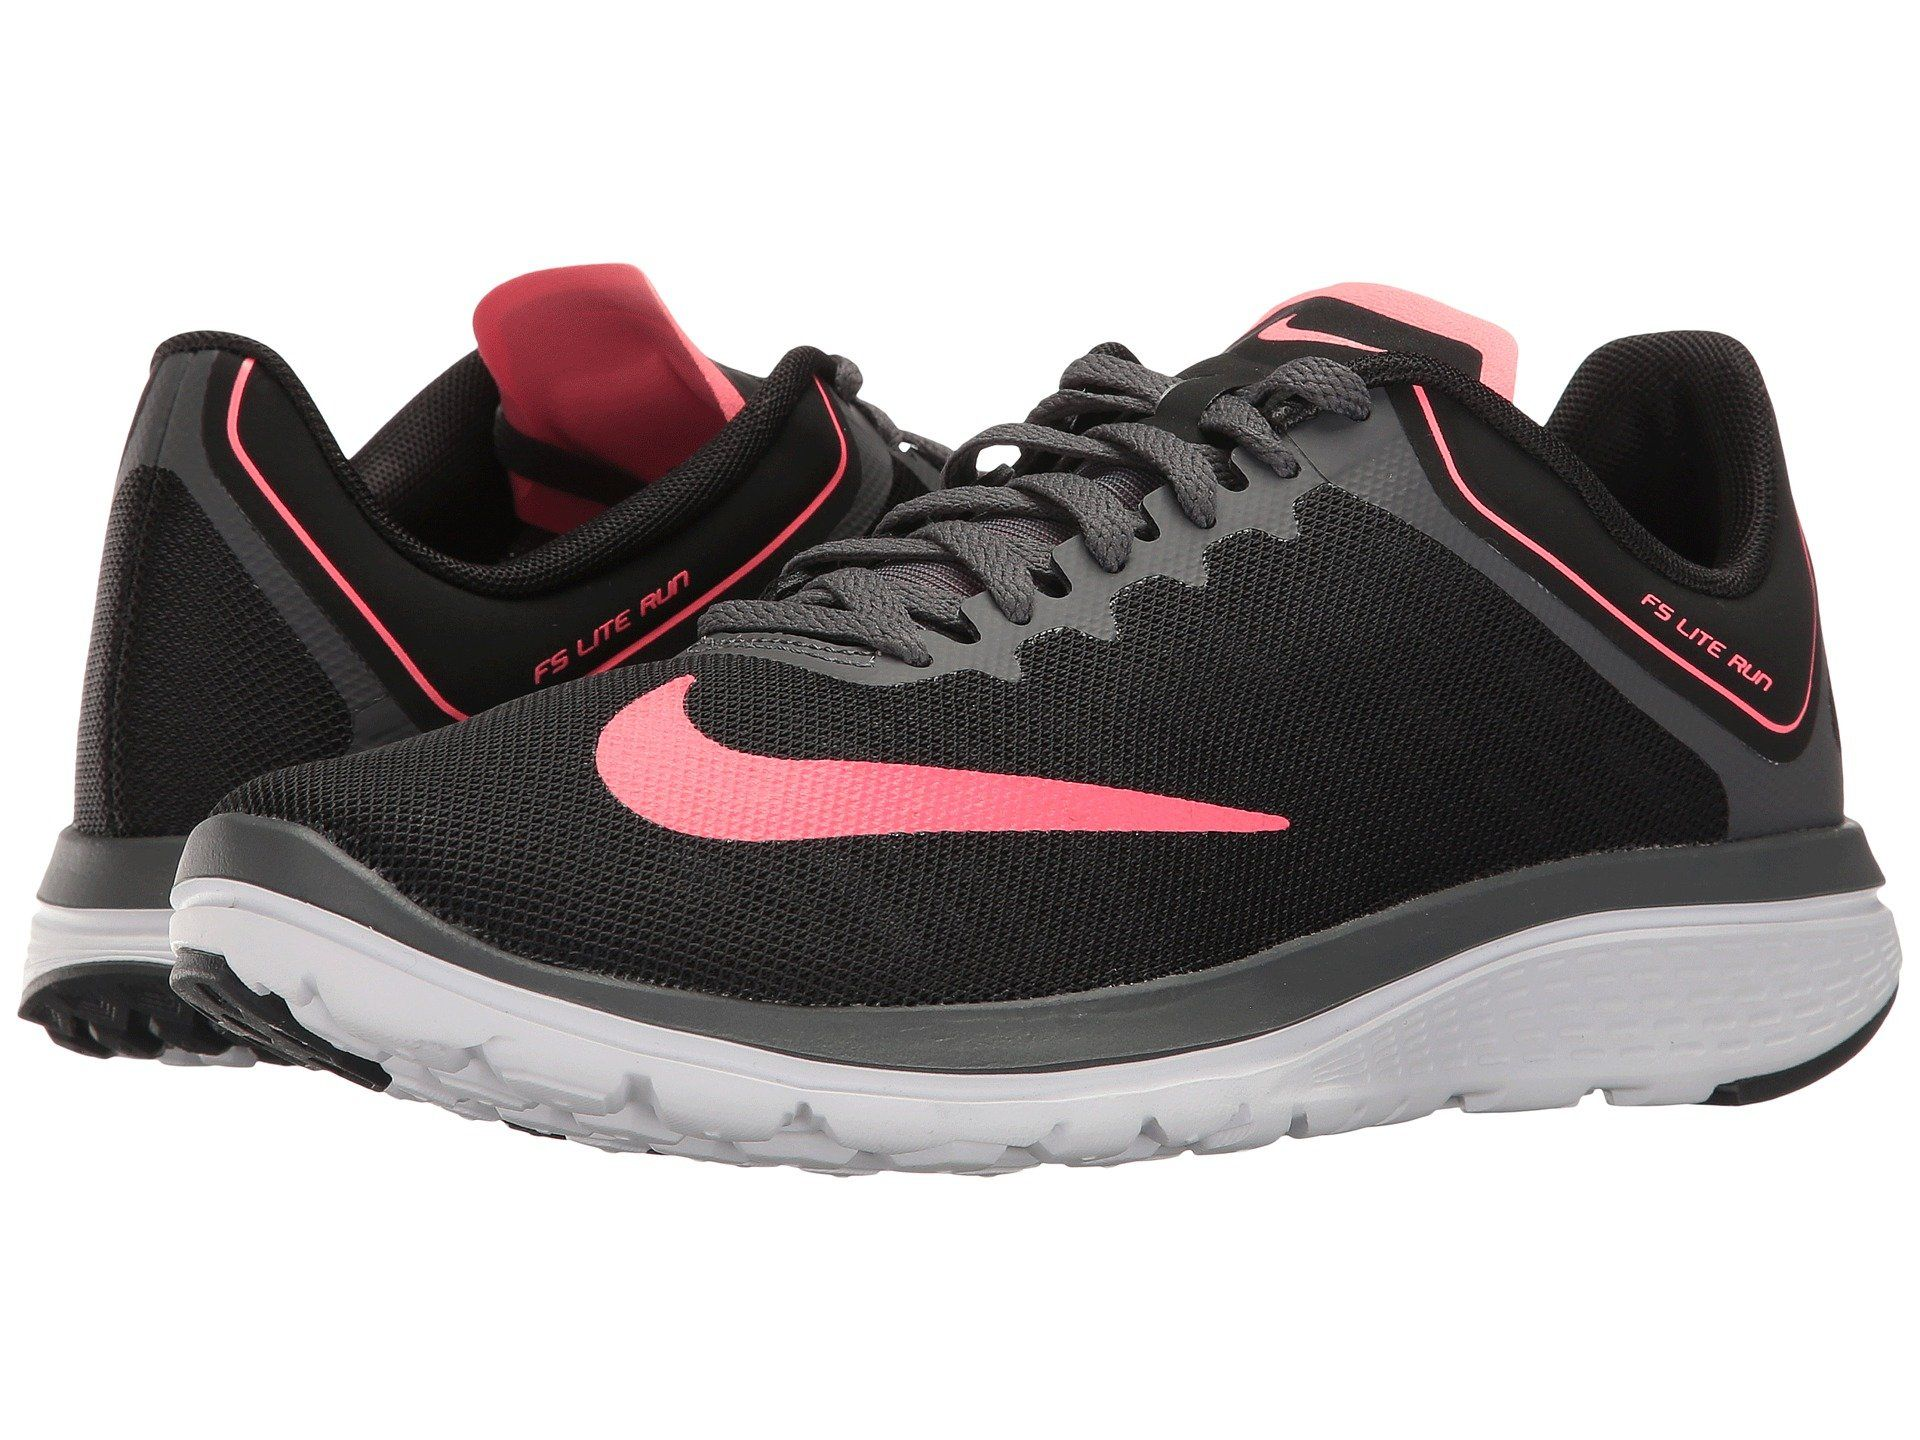 premium selection a5c1e 791b9 NIKE FS Lite Run 4. #nike #shoes # | Nike | Nike, Sneakers ...